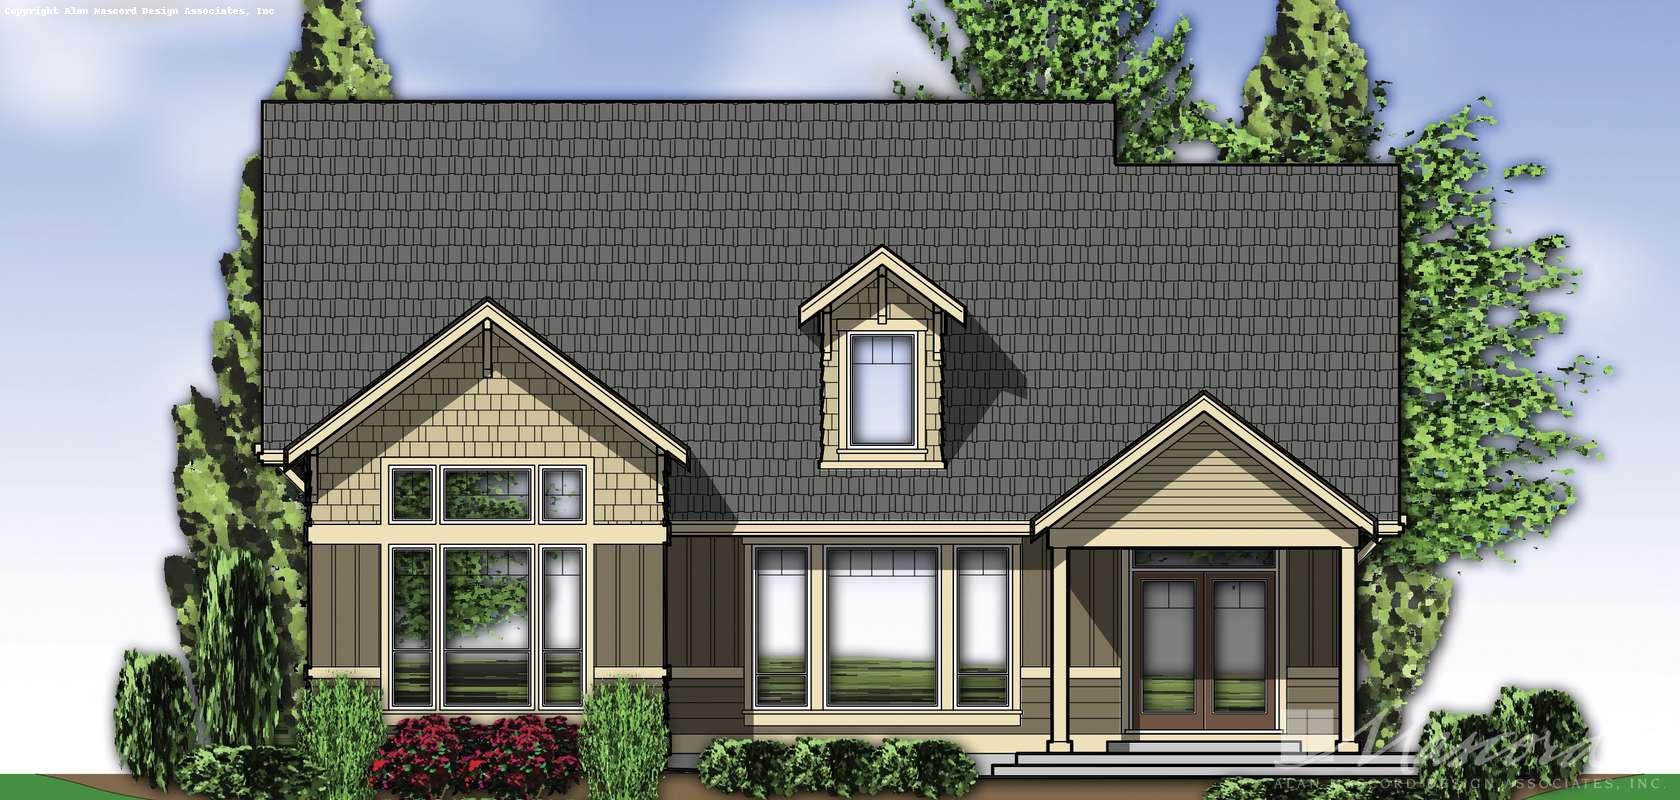 Mascord House Plan 22166: The Tanglewood